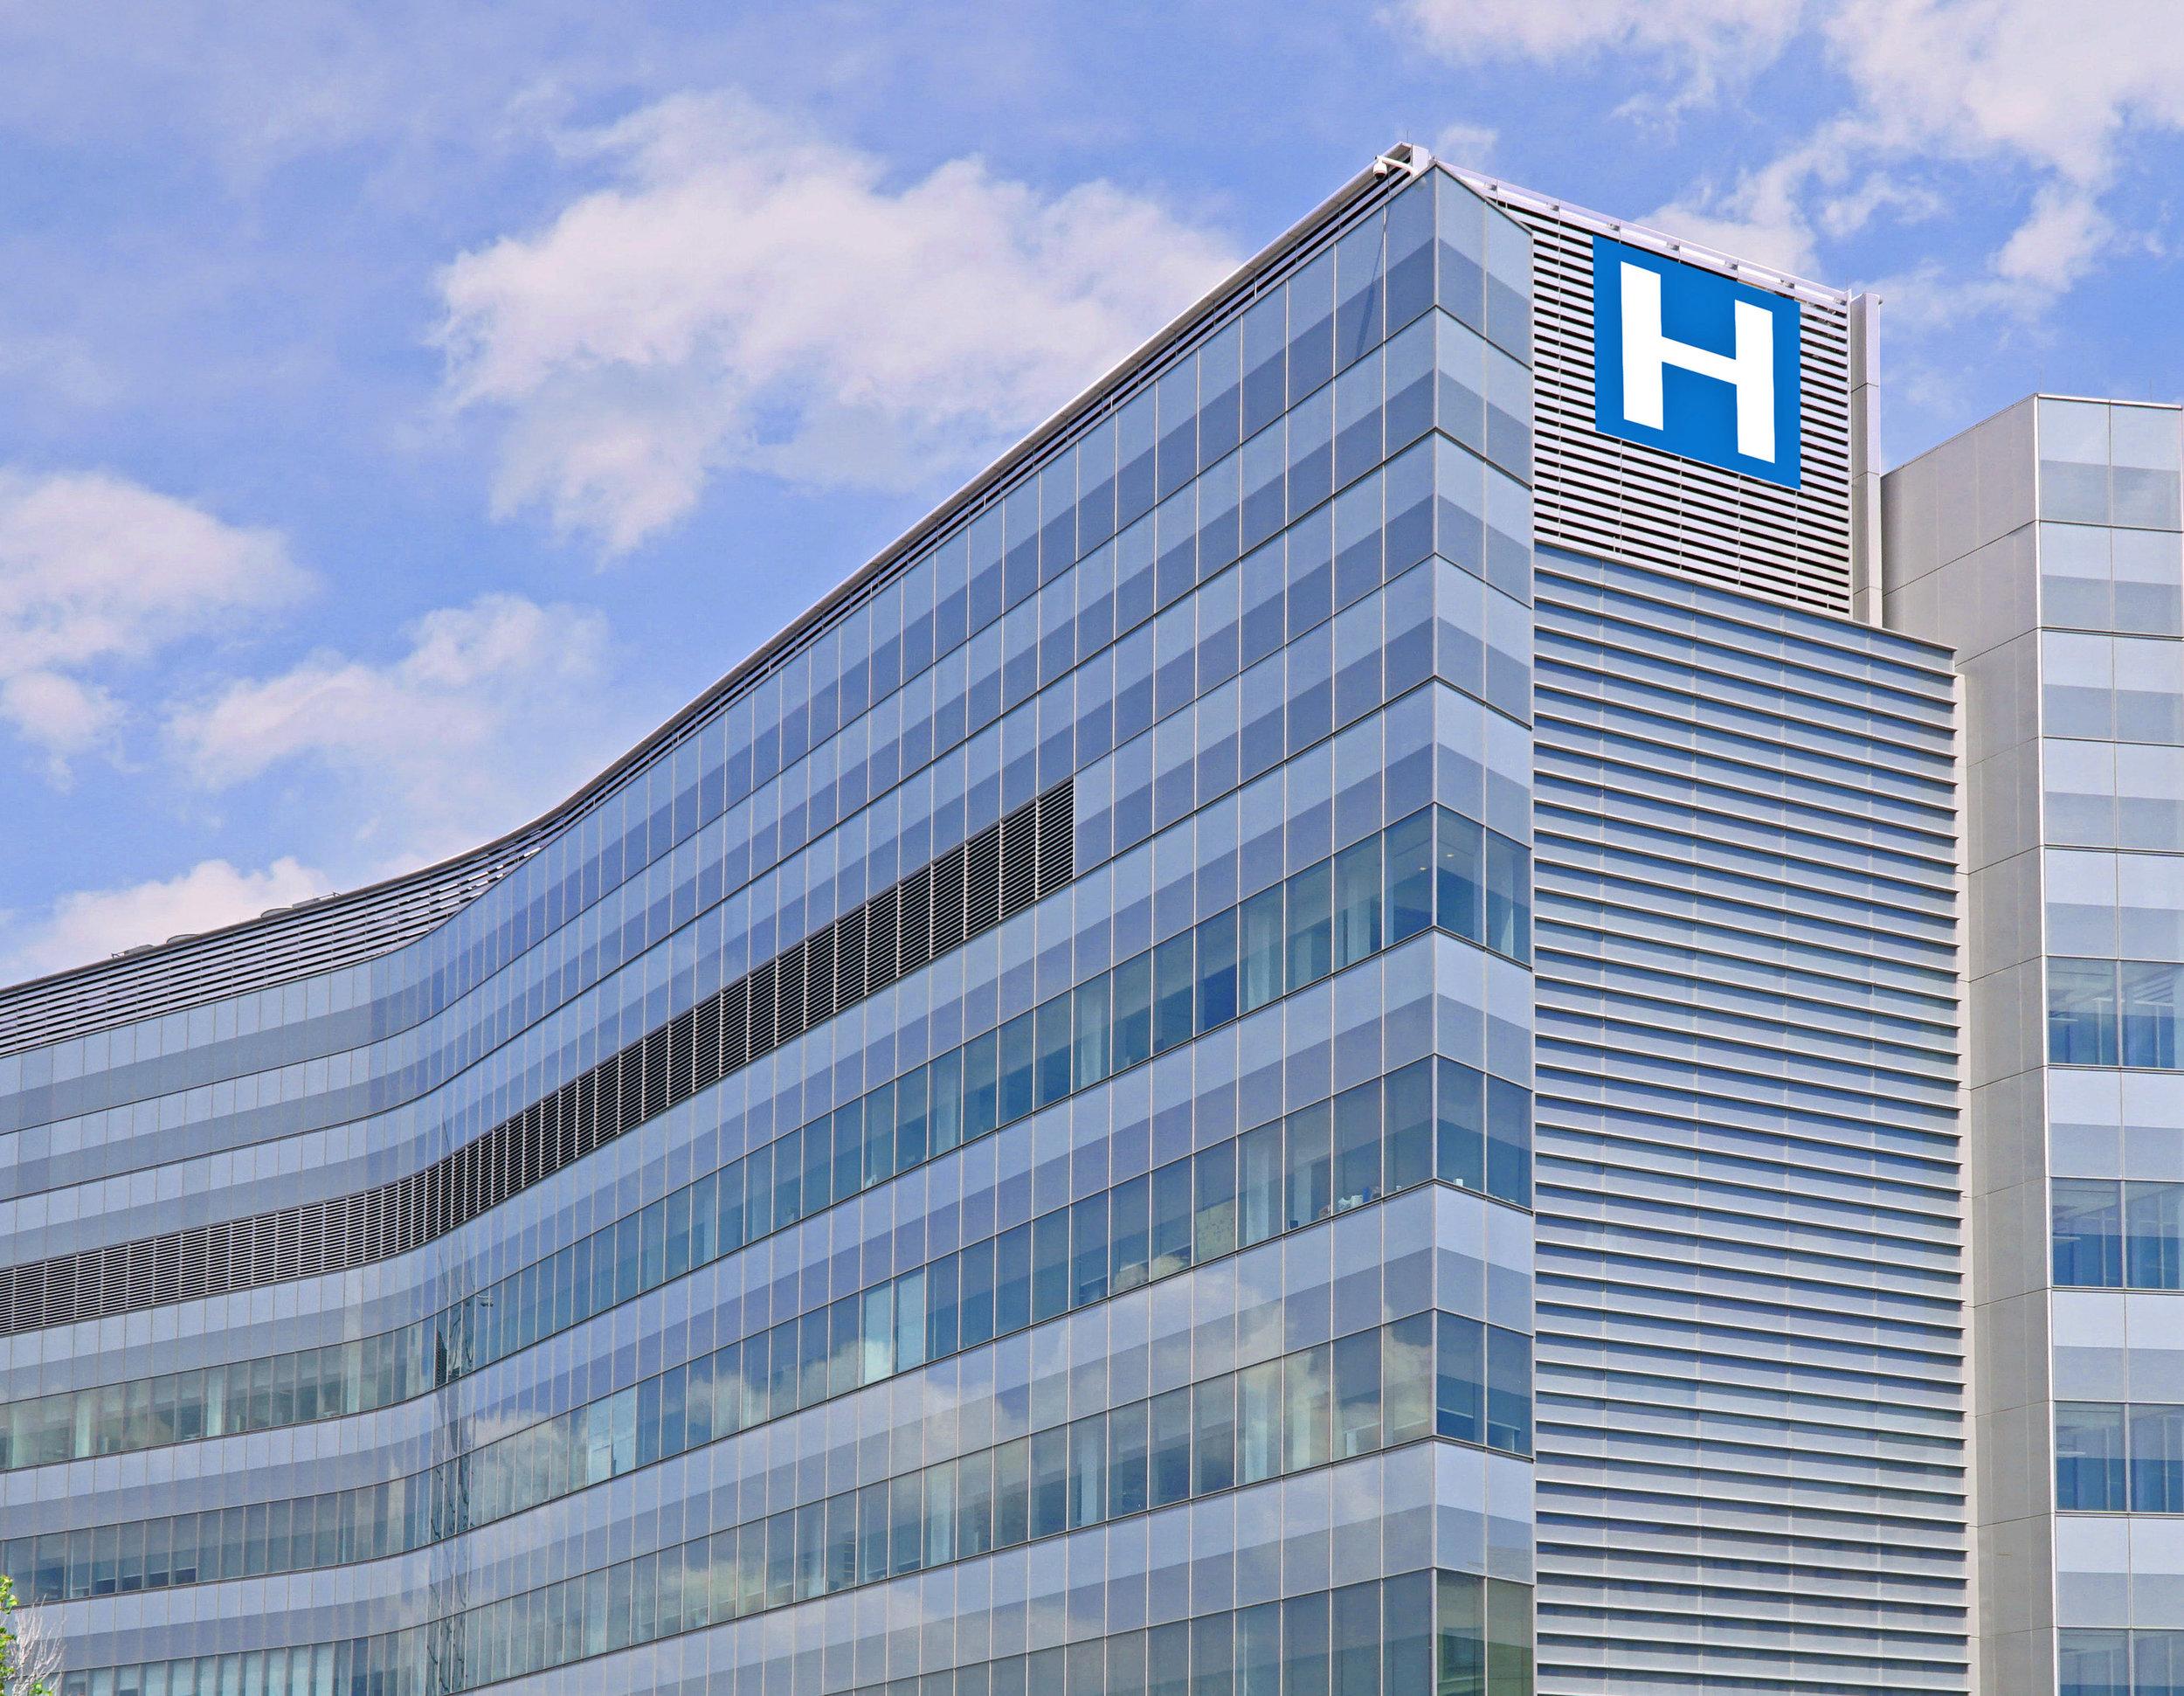 Hospital Fulfillment: Optimizing the Healthcare Supply Chain